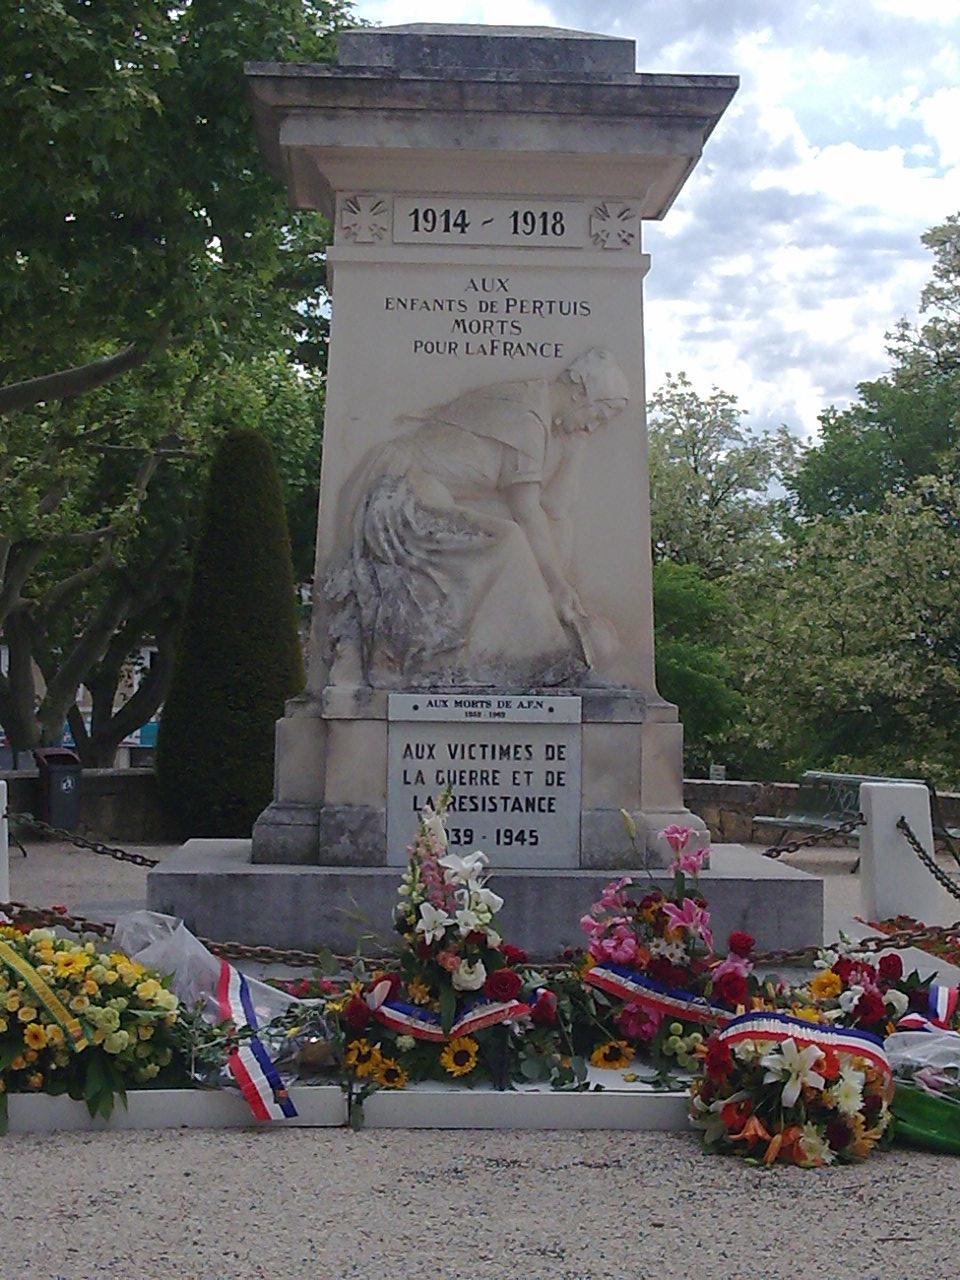 Www.rencontres-arles.com/monuments aux morts